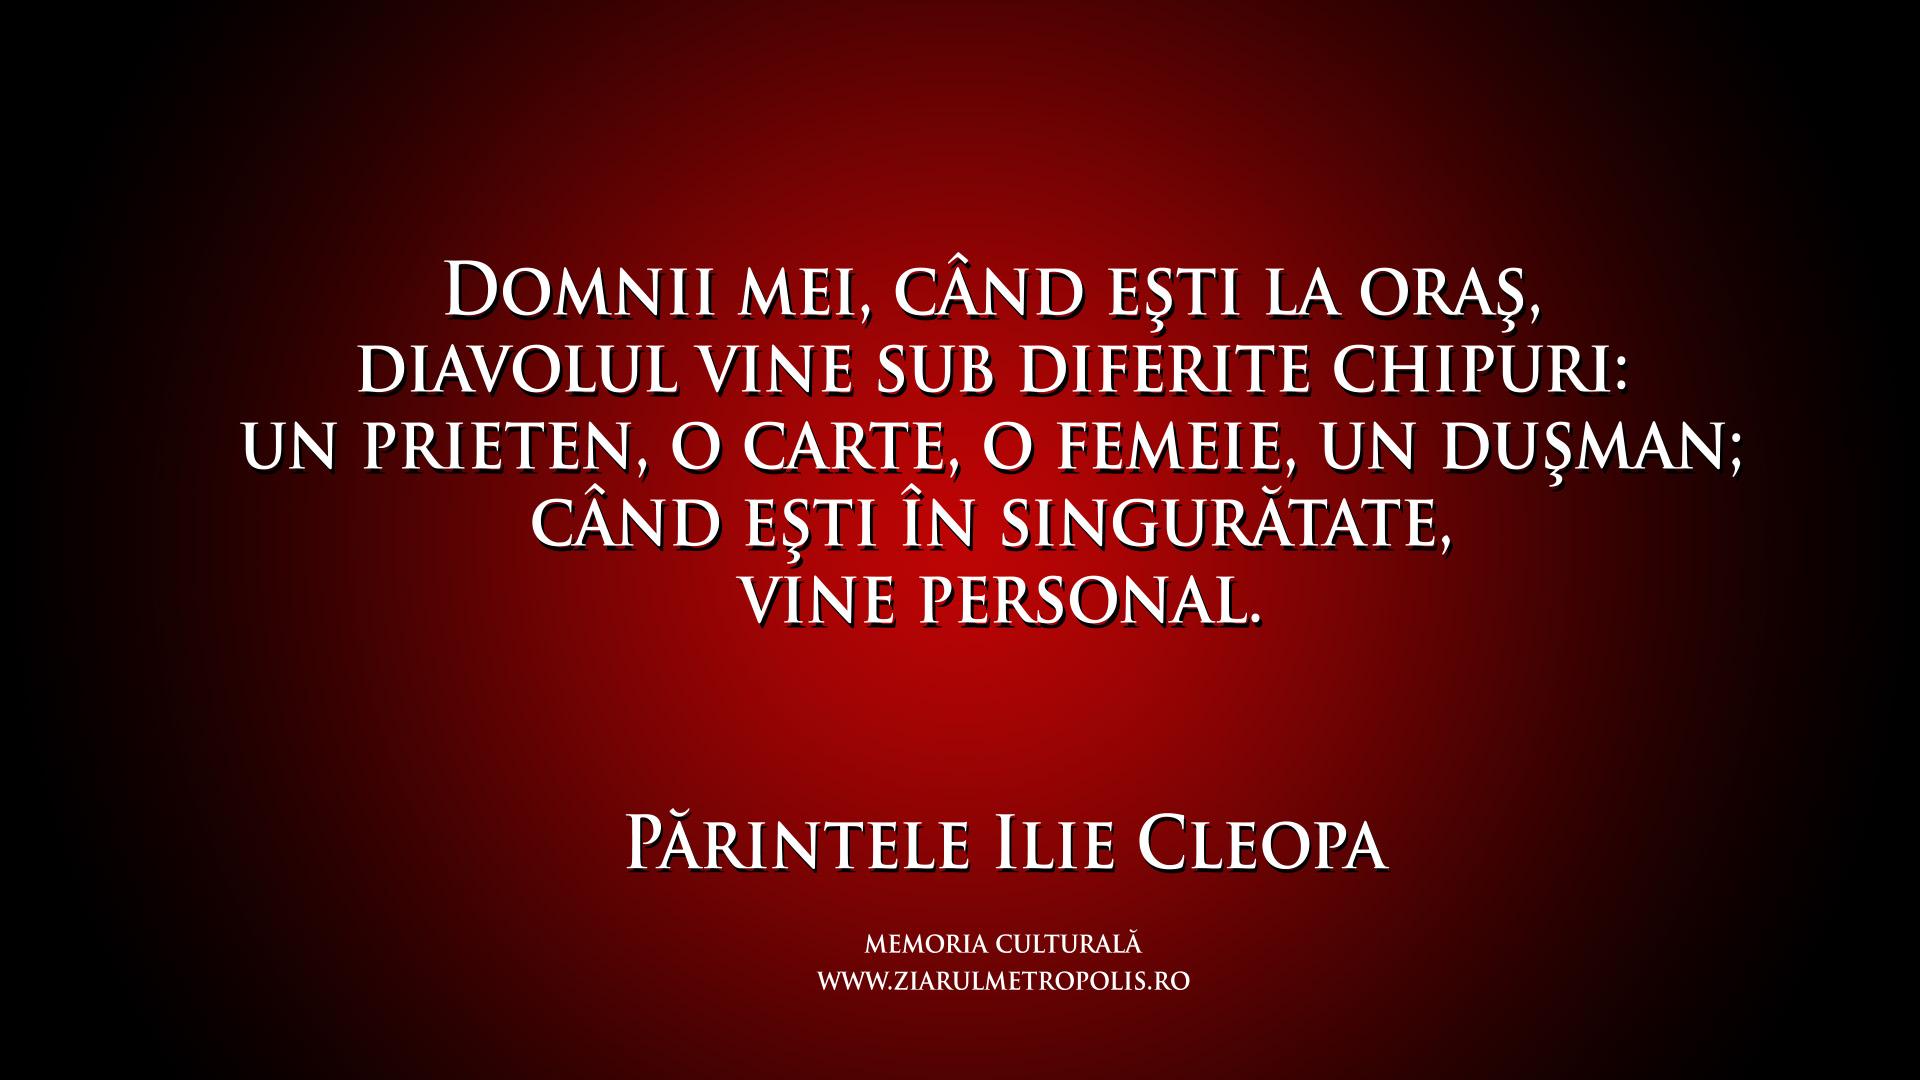 Ilie Cleopa